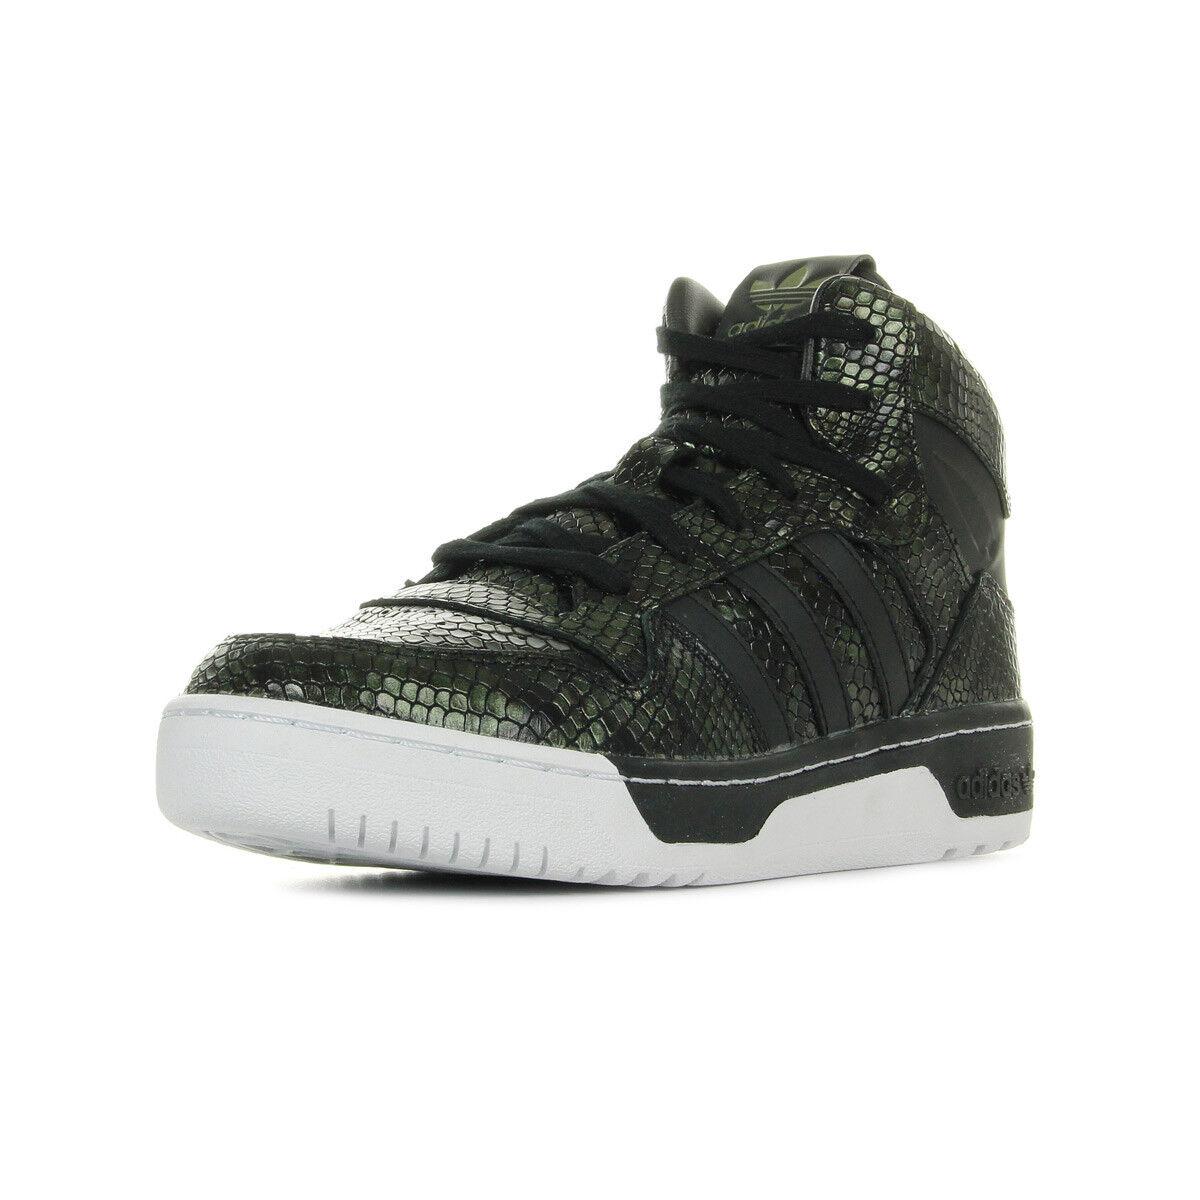 Schuhe adidas Damen M Attitude Revive W schwarz